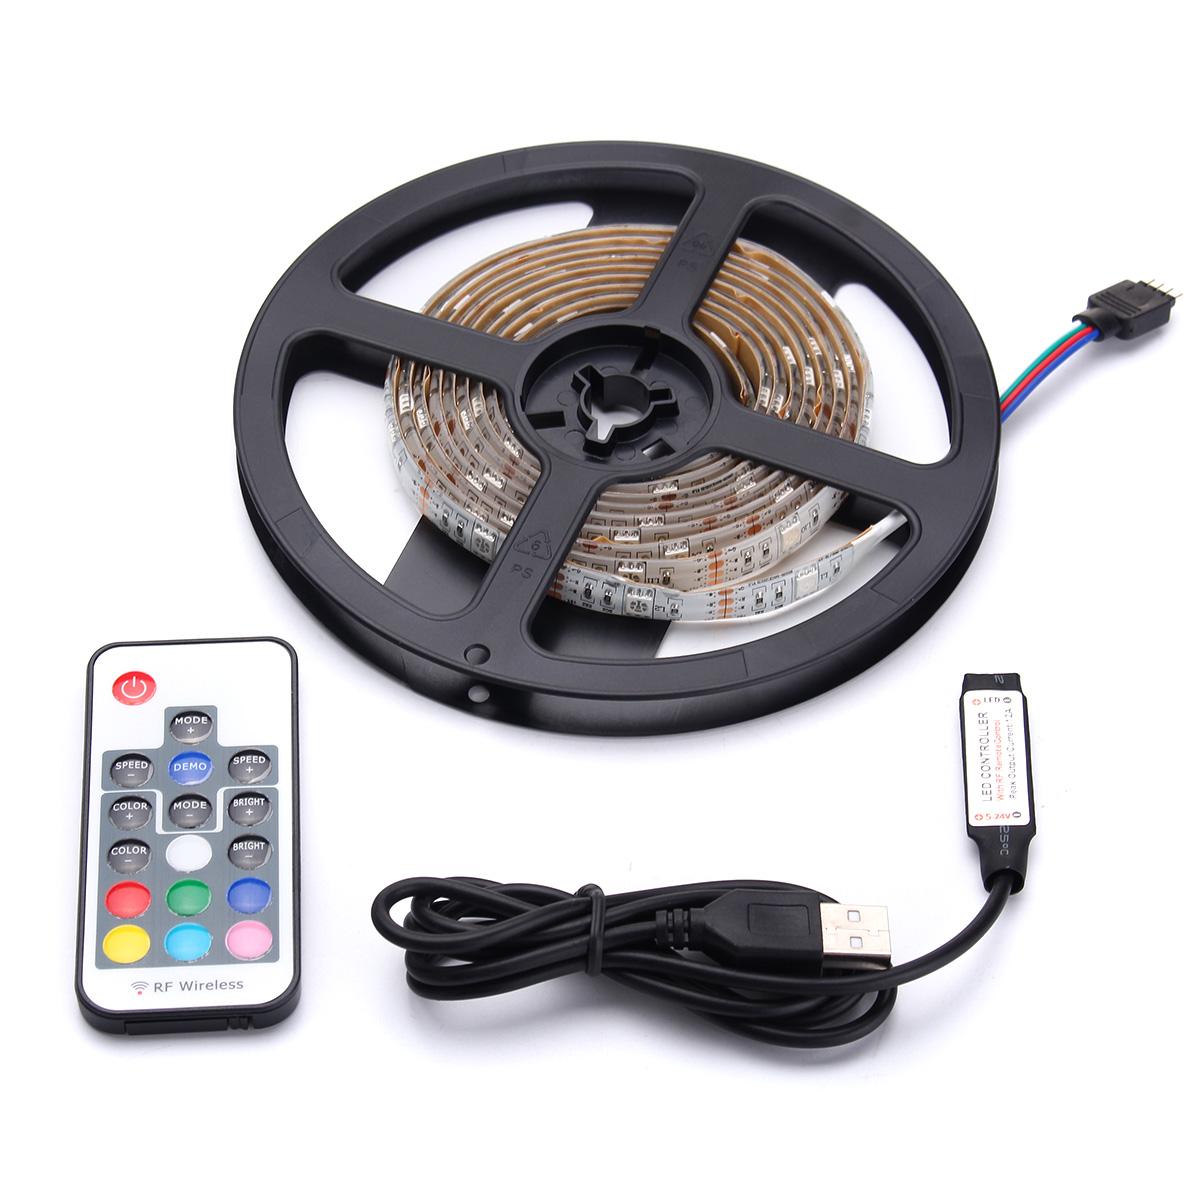 DC5V USB RGB 5050 Waterproof 17 Keys Remote Control LED Strip TV Back Lighting Kit